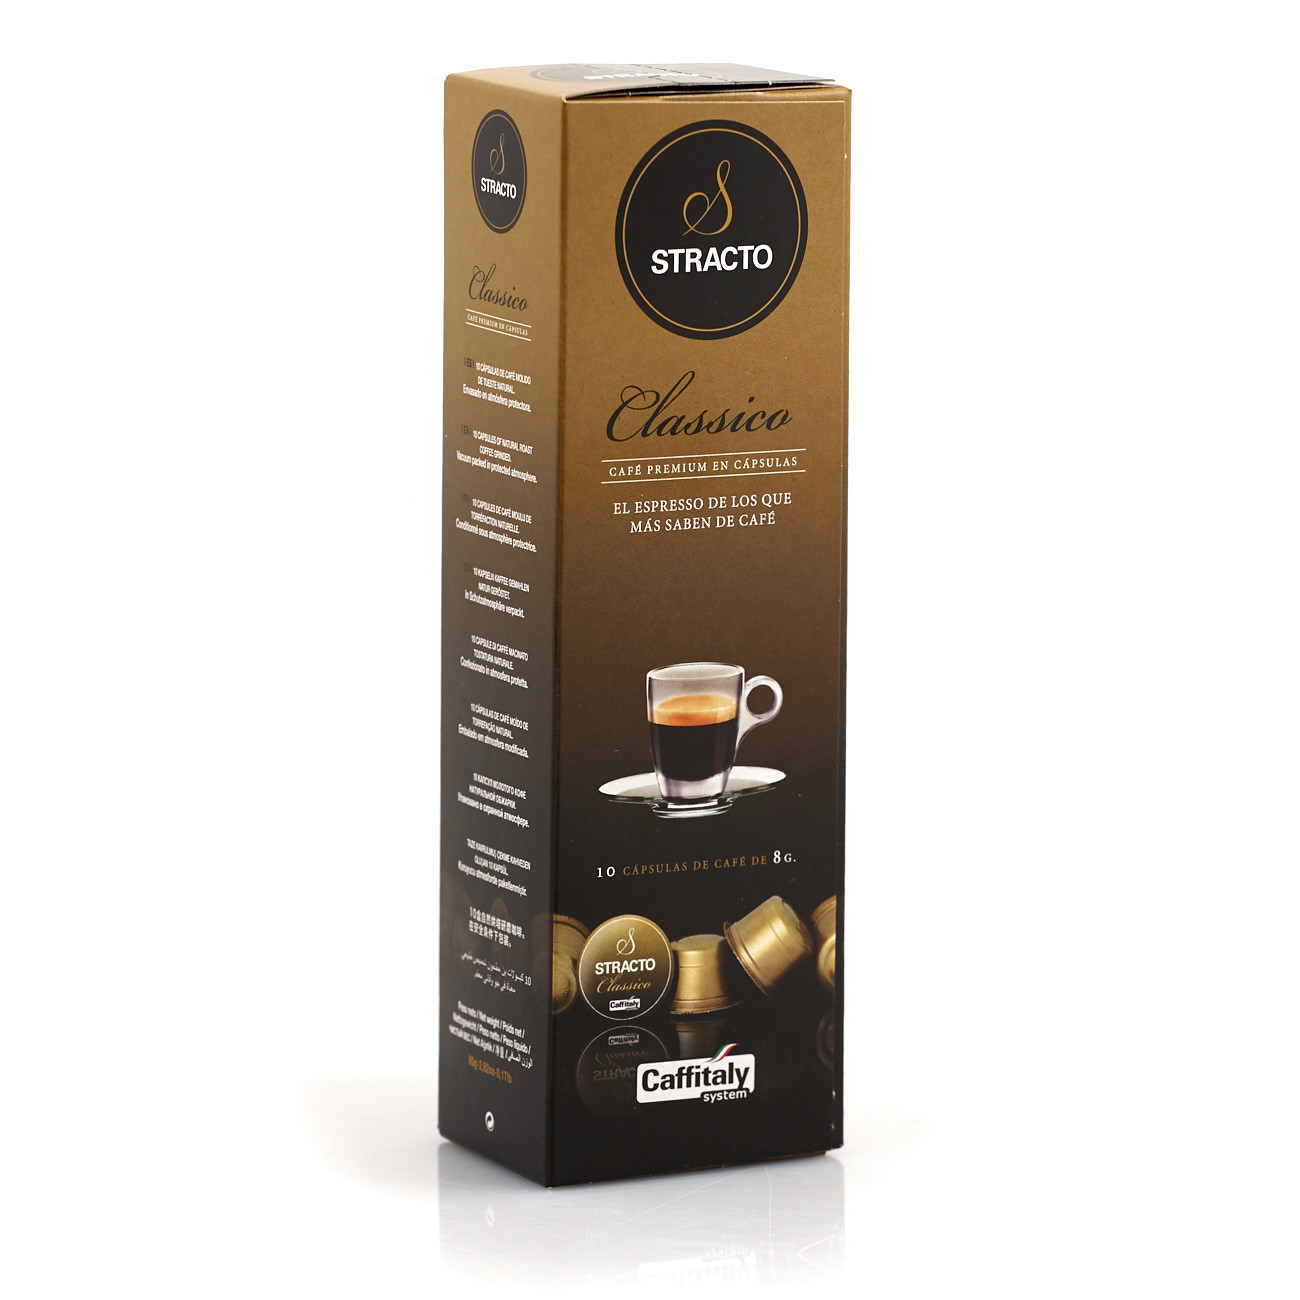 Stracto Classico Caffitaly kaffekapsler